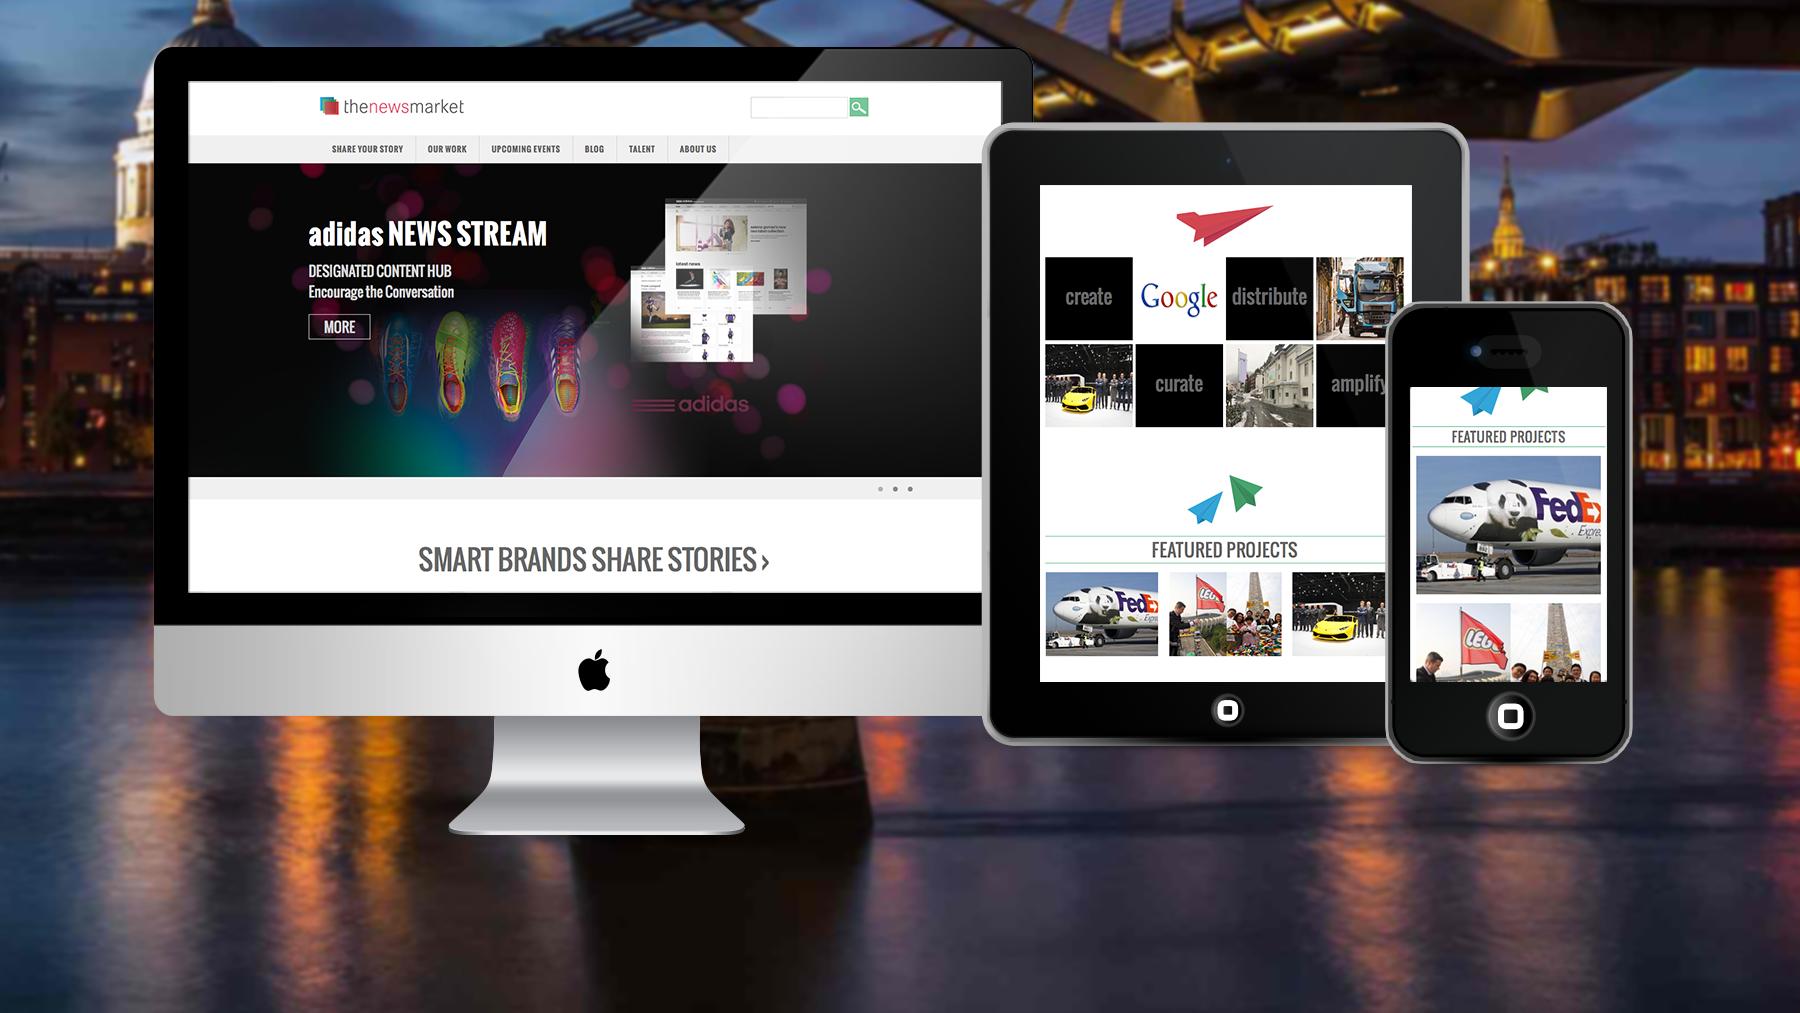 The Newsmarket WordPress website design